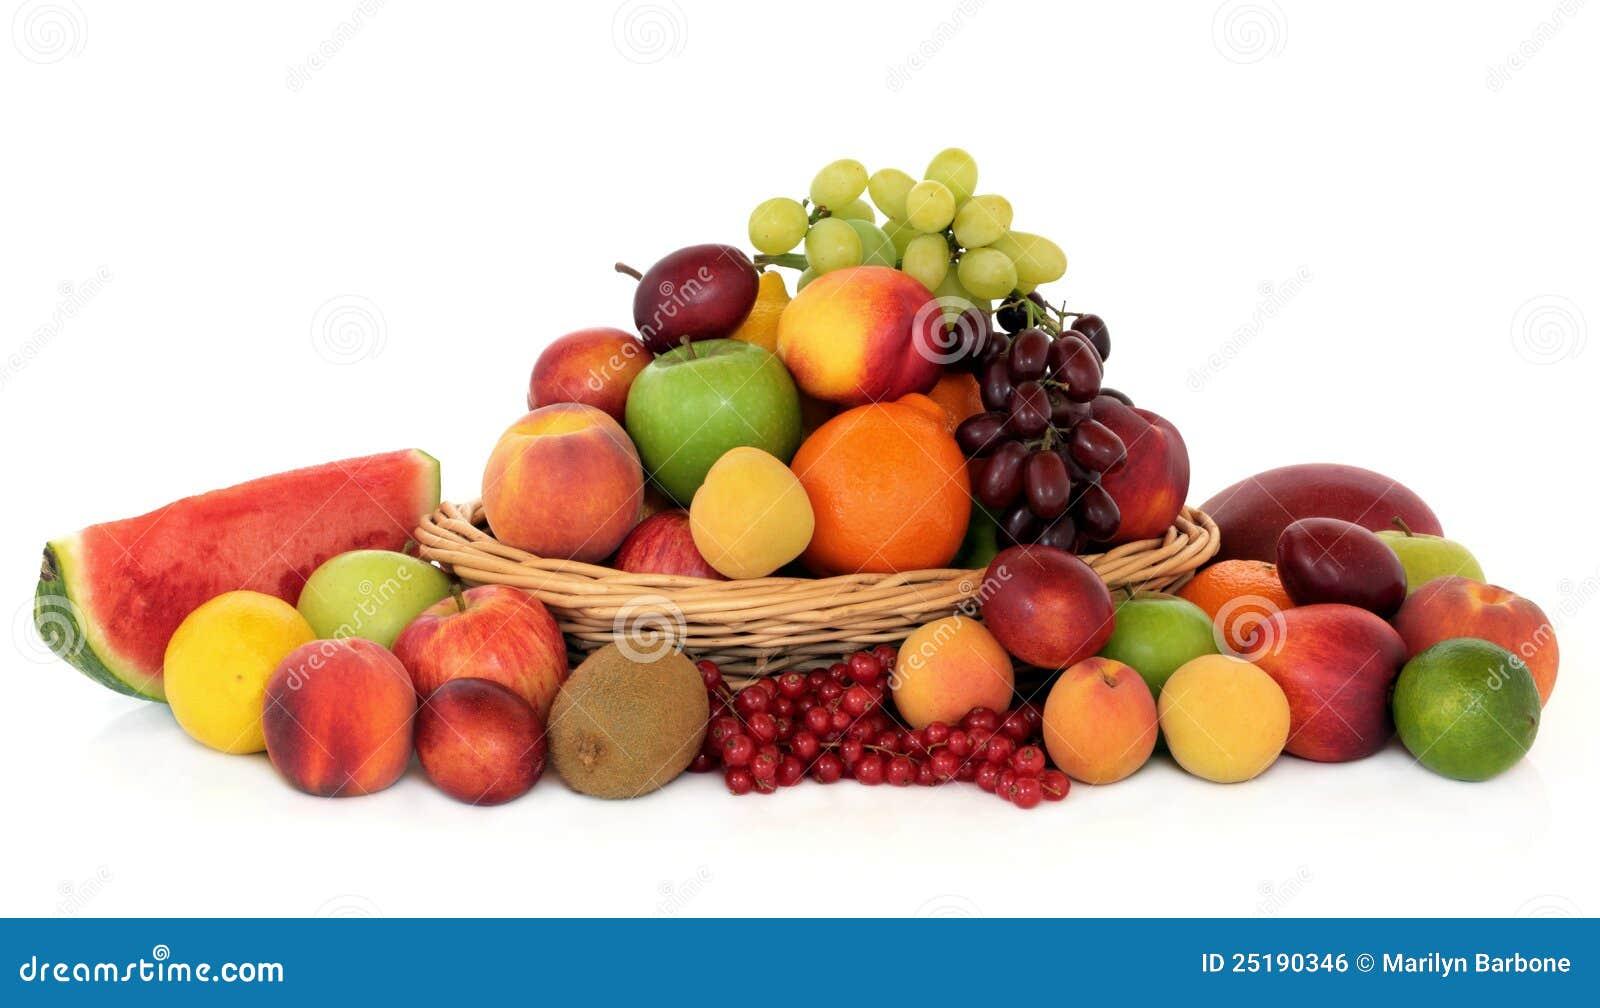 healthy fruit baskets is sugar in fruit healthy